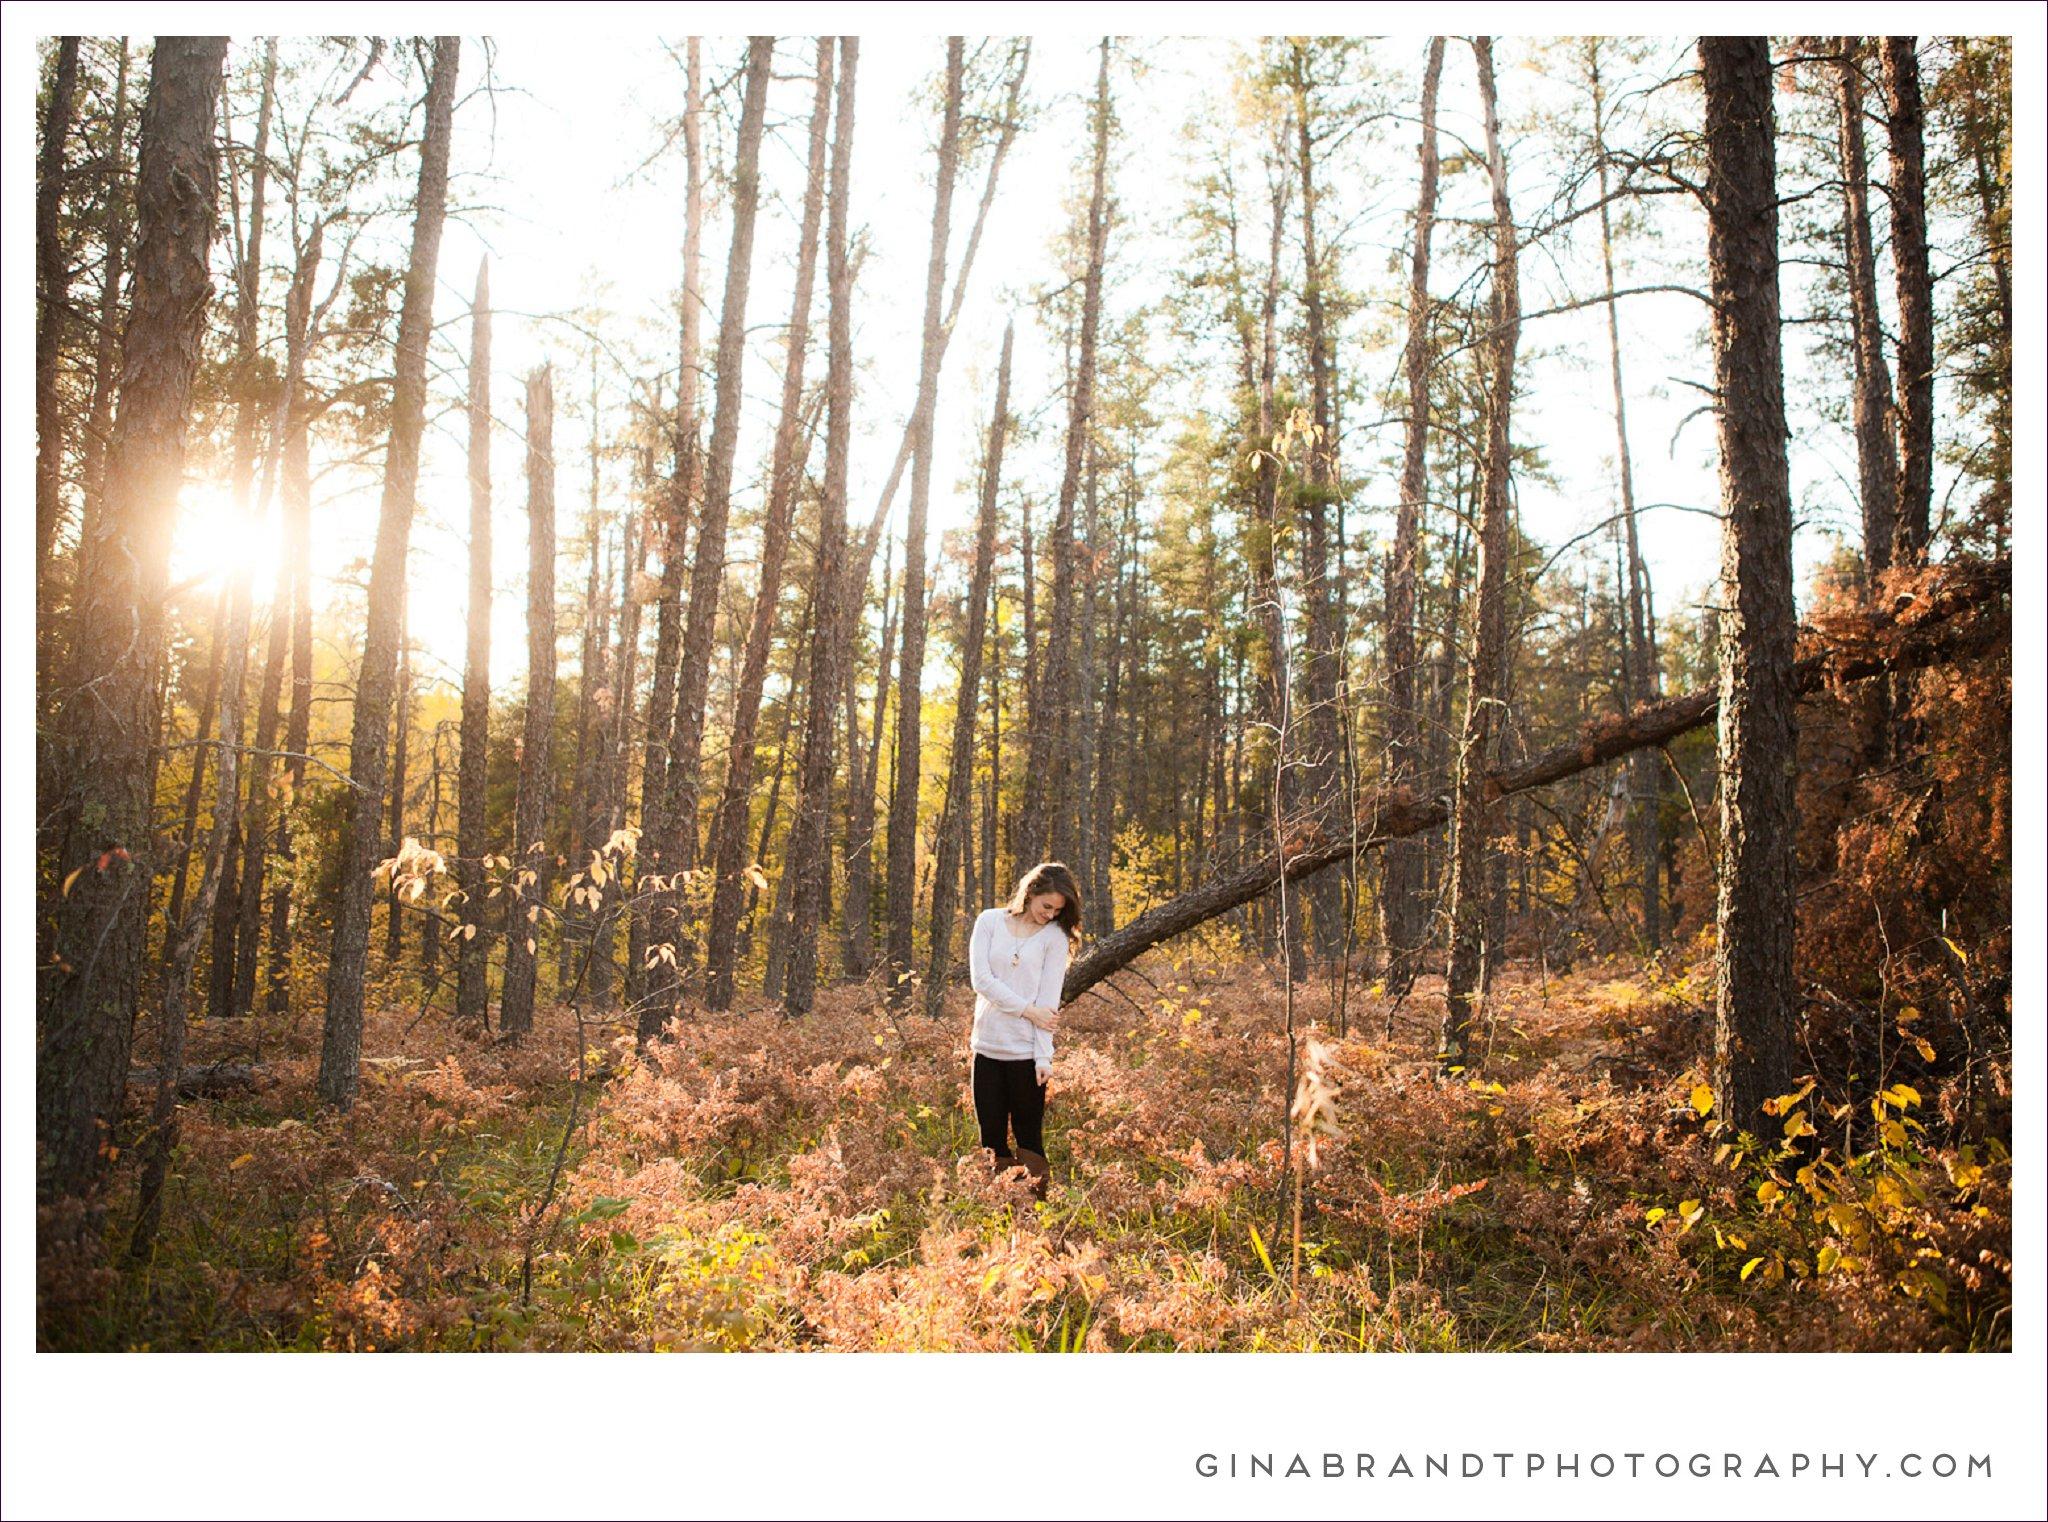 Gina Brandt Photography_0015.jpg